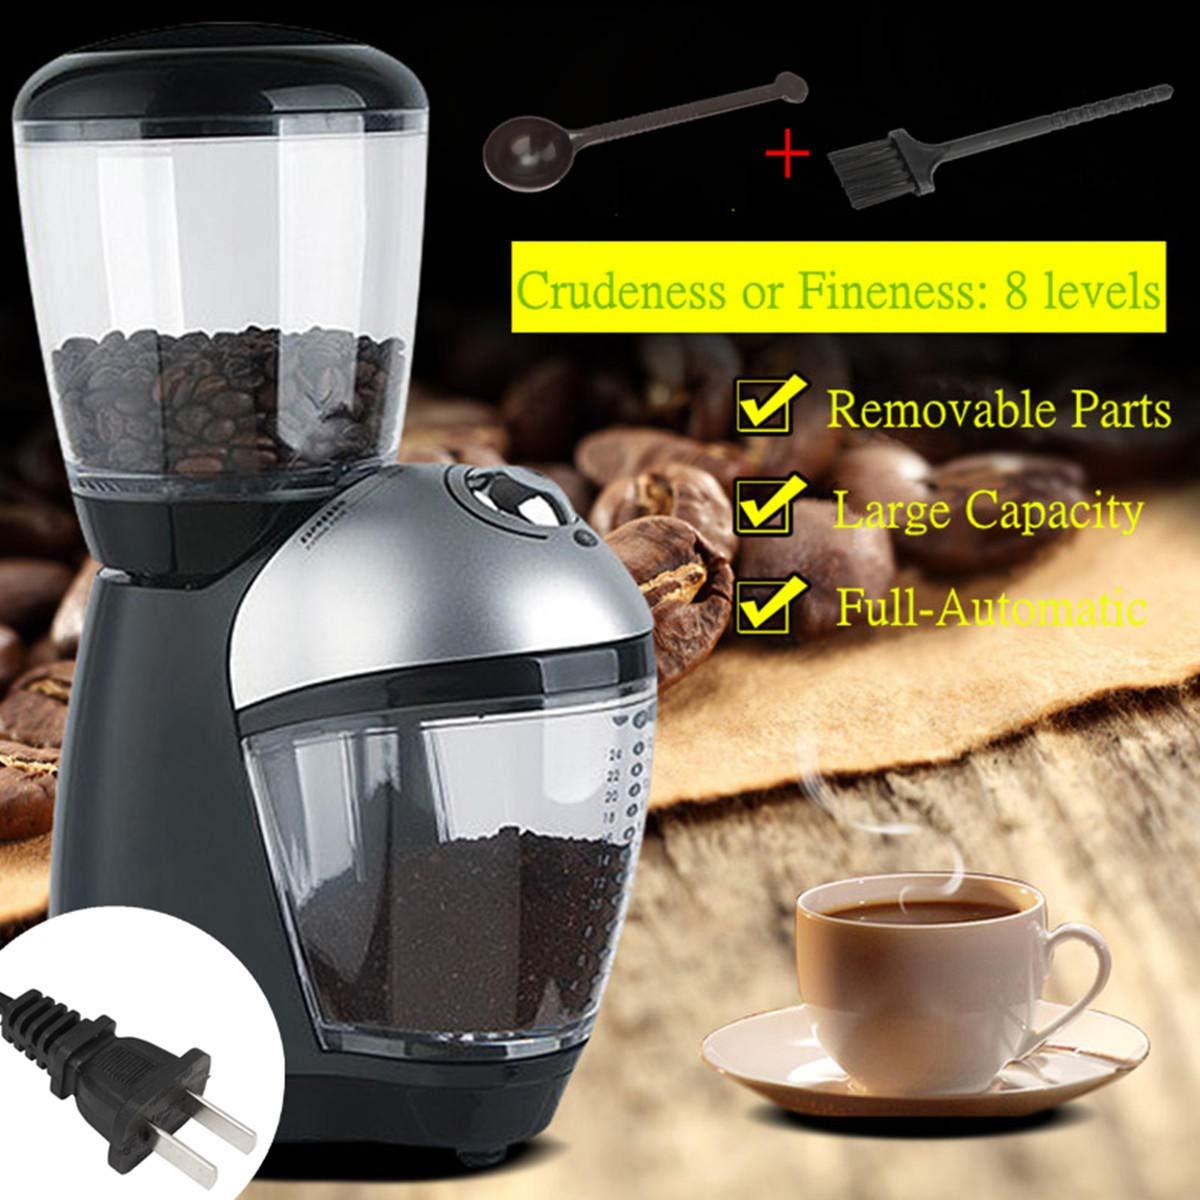 Coffee Bean Grinder - Coffee Grinder Electric - 220-240V 50/60Hz Electric Automatic Coffee Bean Mill Grinder Machine Kitchen US Plug (Coffee Maker Grinder)